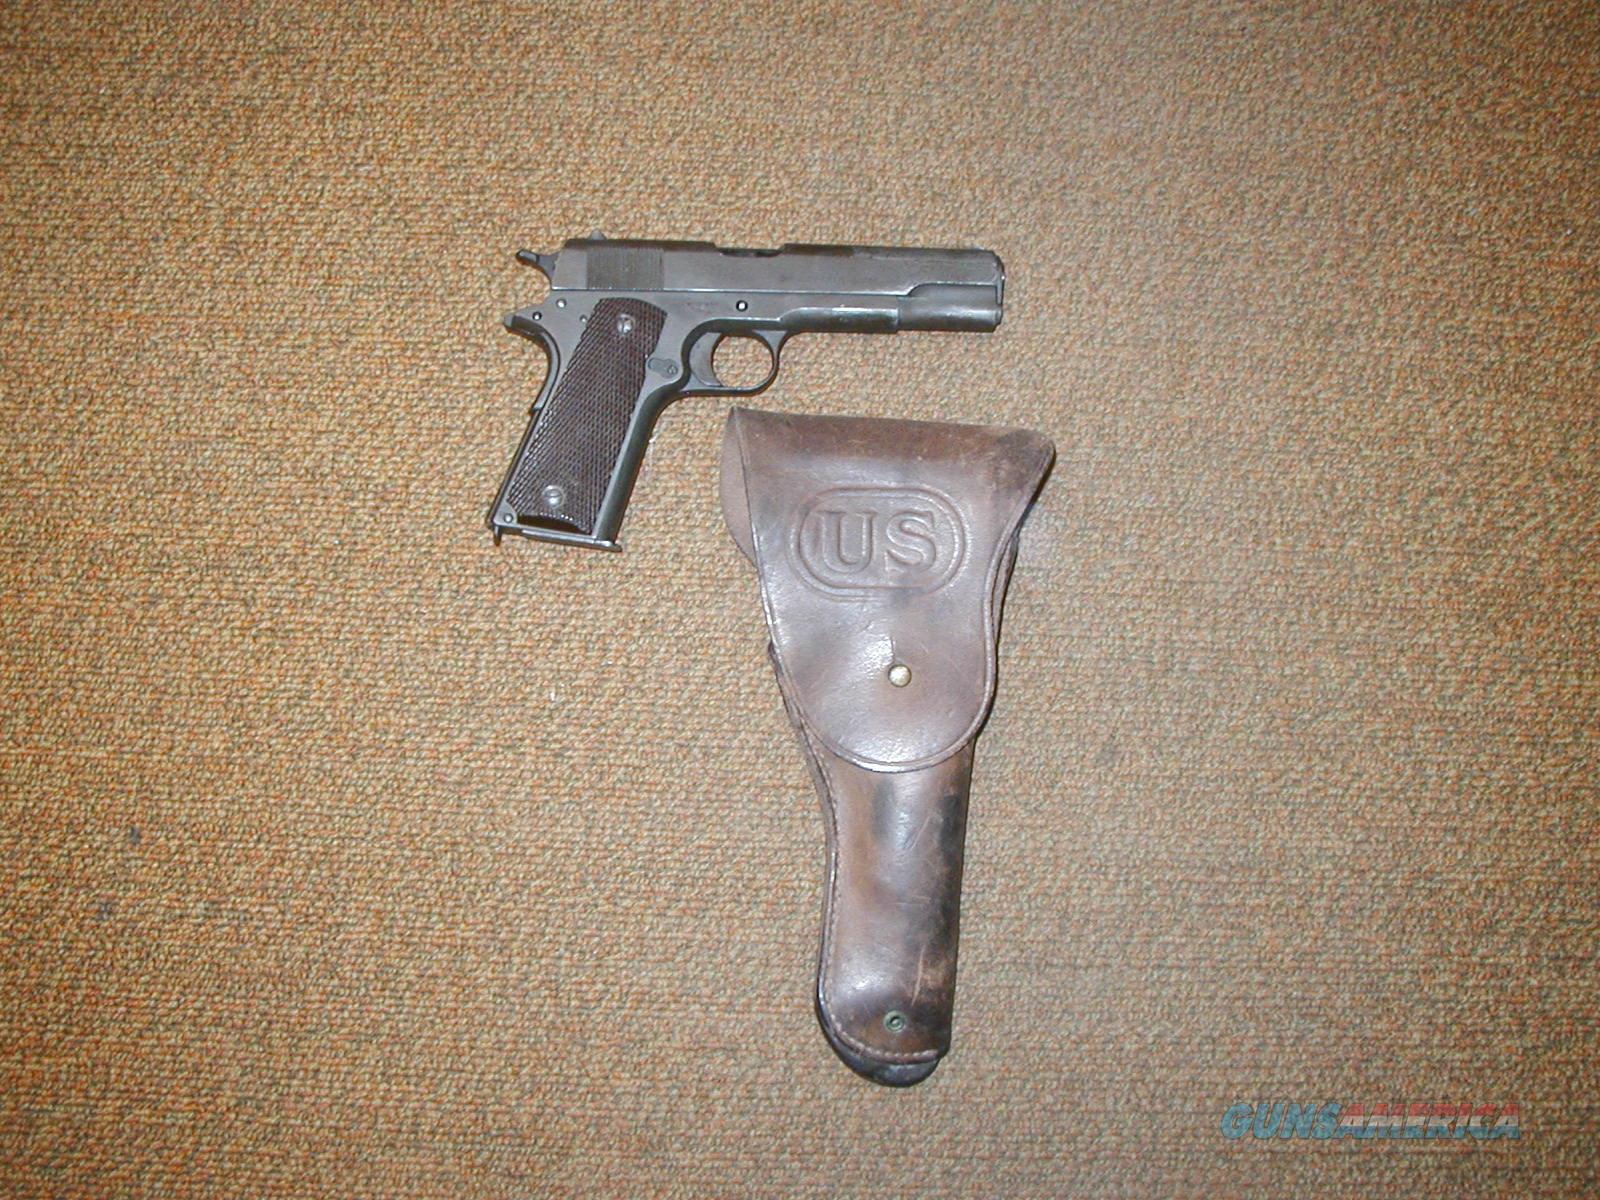 COLT 1914 US ARMY  1911 PISTOL WITH HOLSTER  Guns > Pistols > Colt Automatic Pistols (1911 & Var)